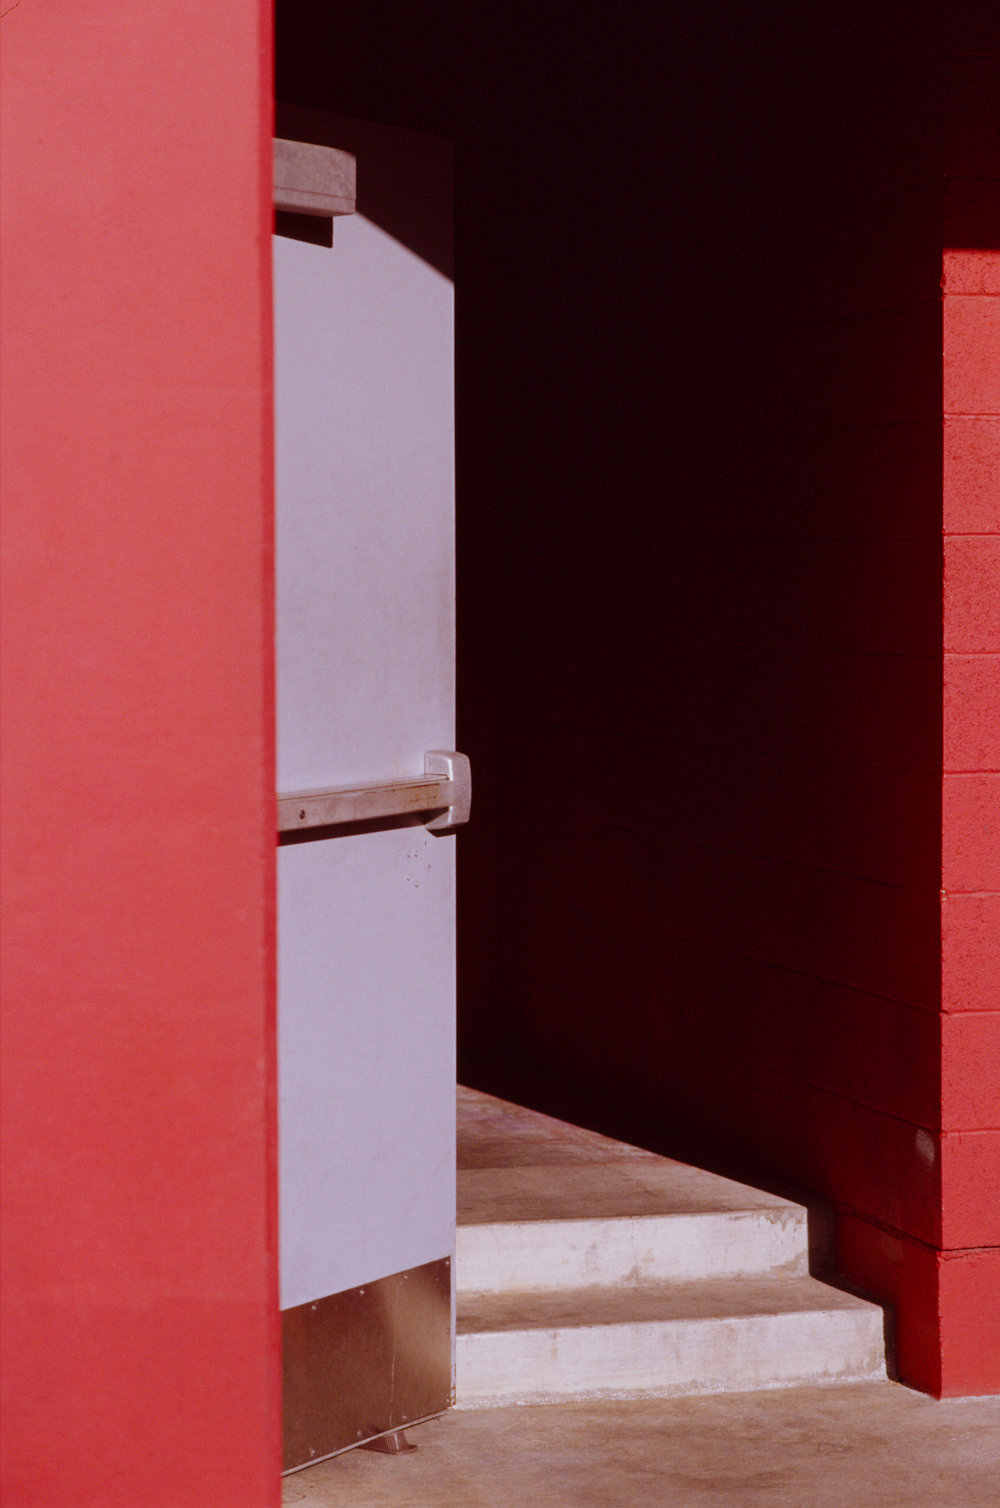 La Brea Alley, Kodak Ektachrome 100SW